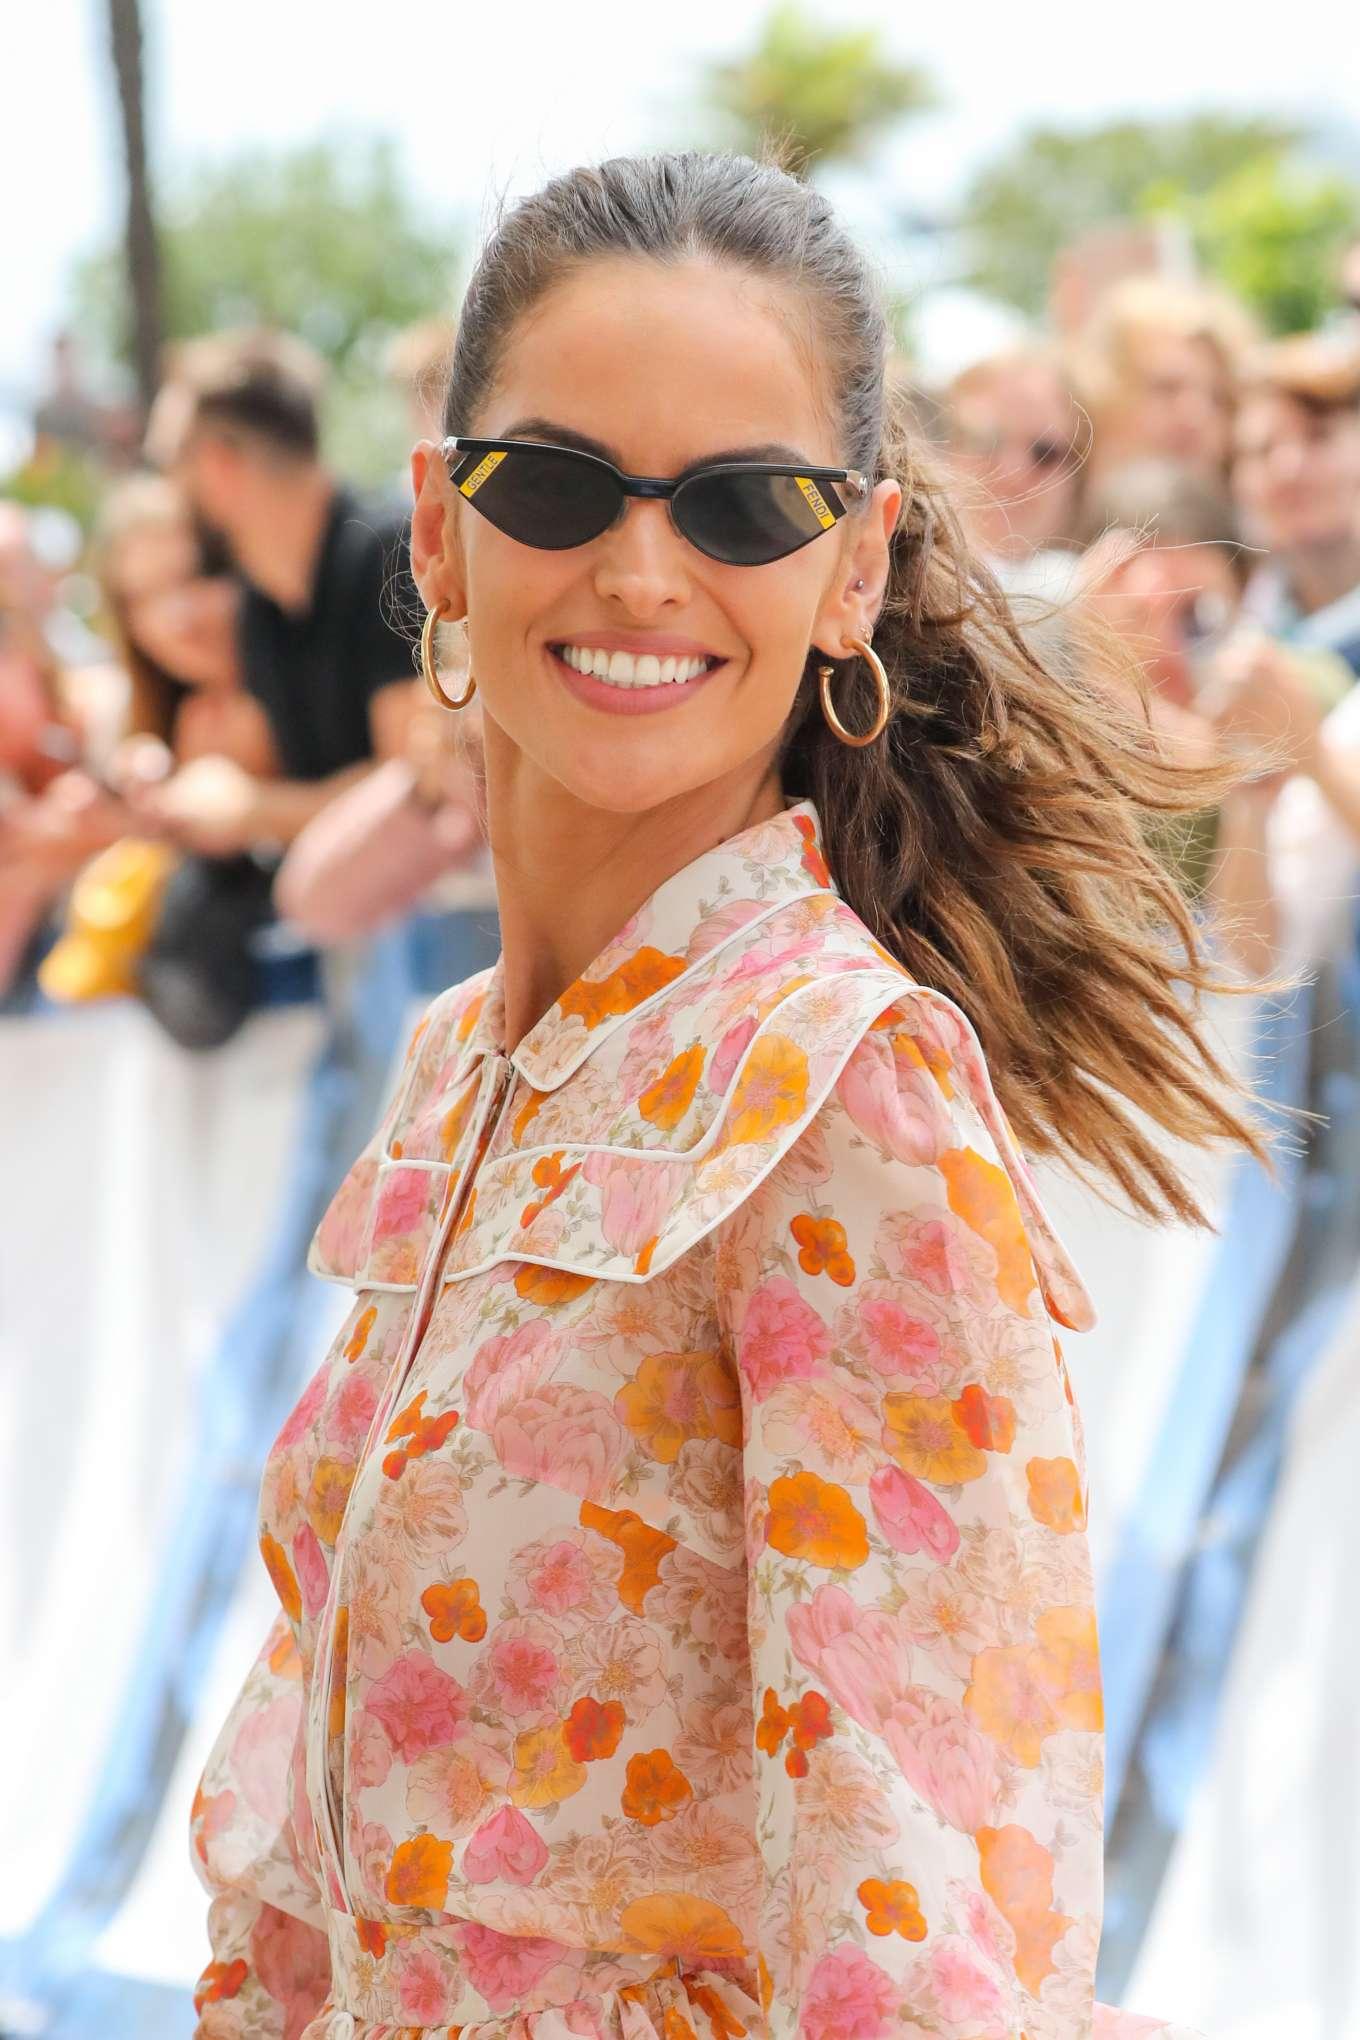 Izabel Goulart 2019 : Izabel Goulart in Floral Print Dress at the Martinez Hotel-15